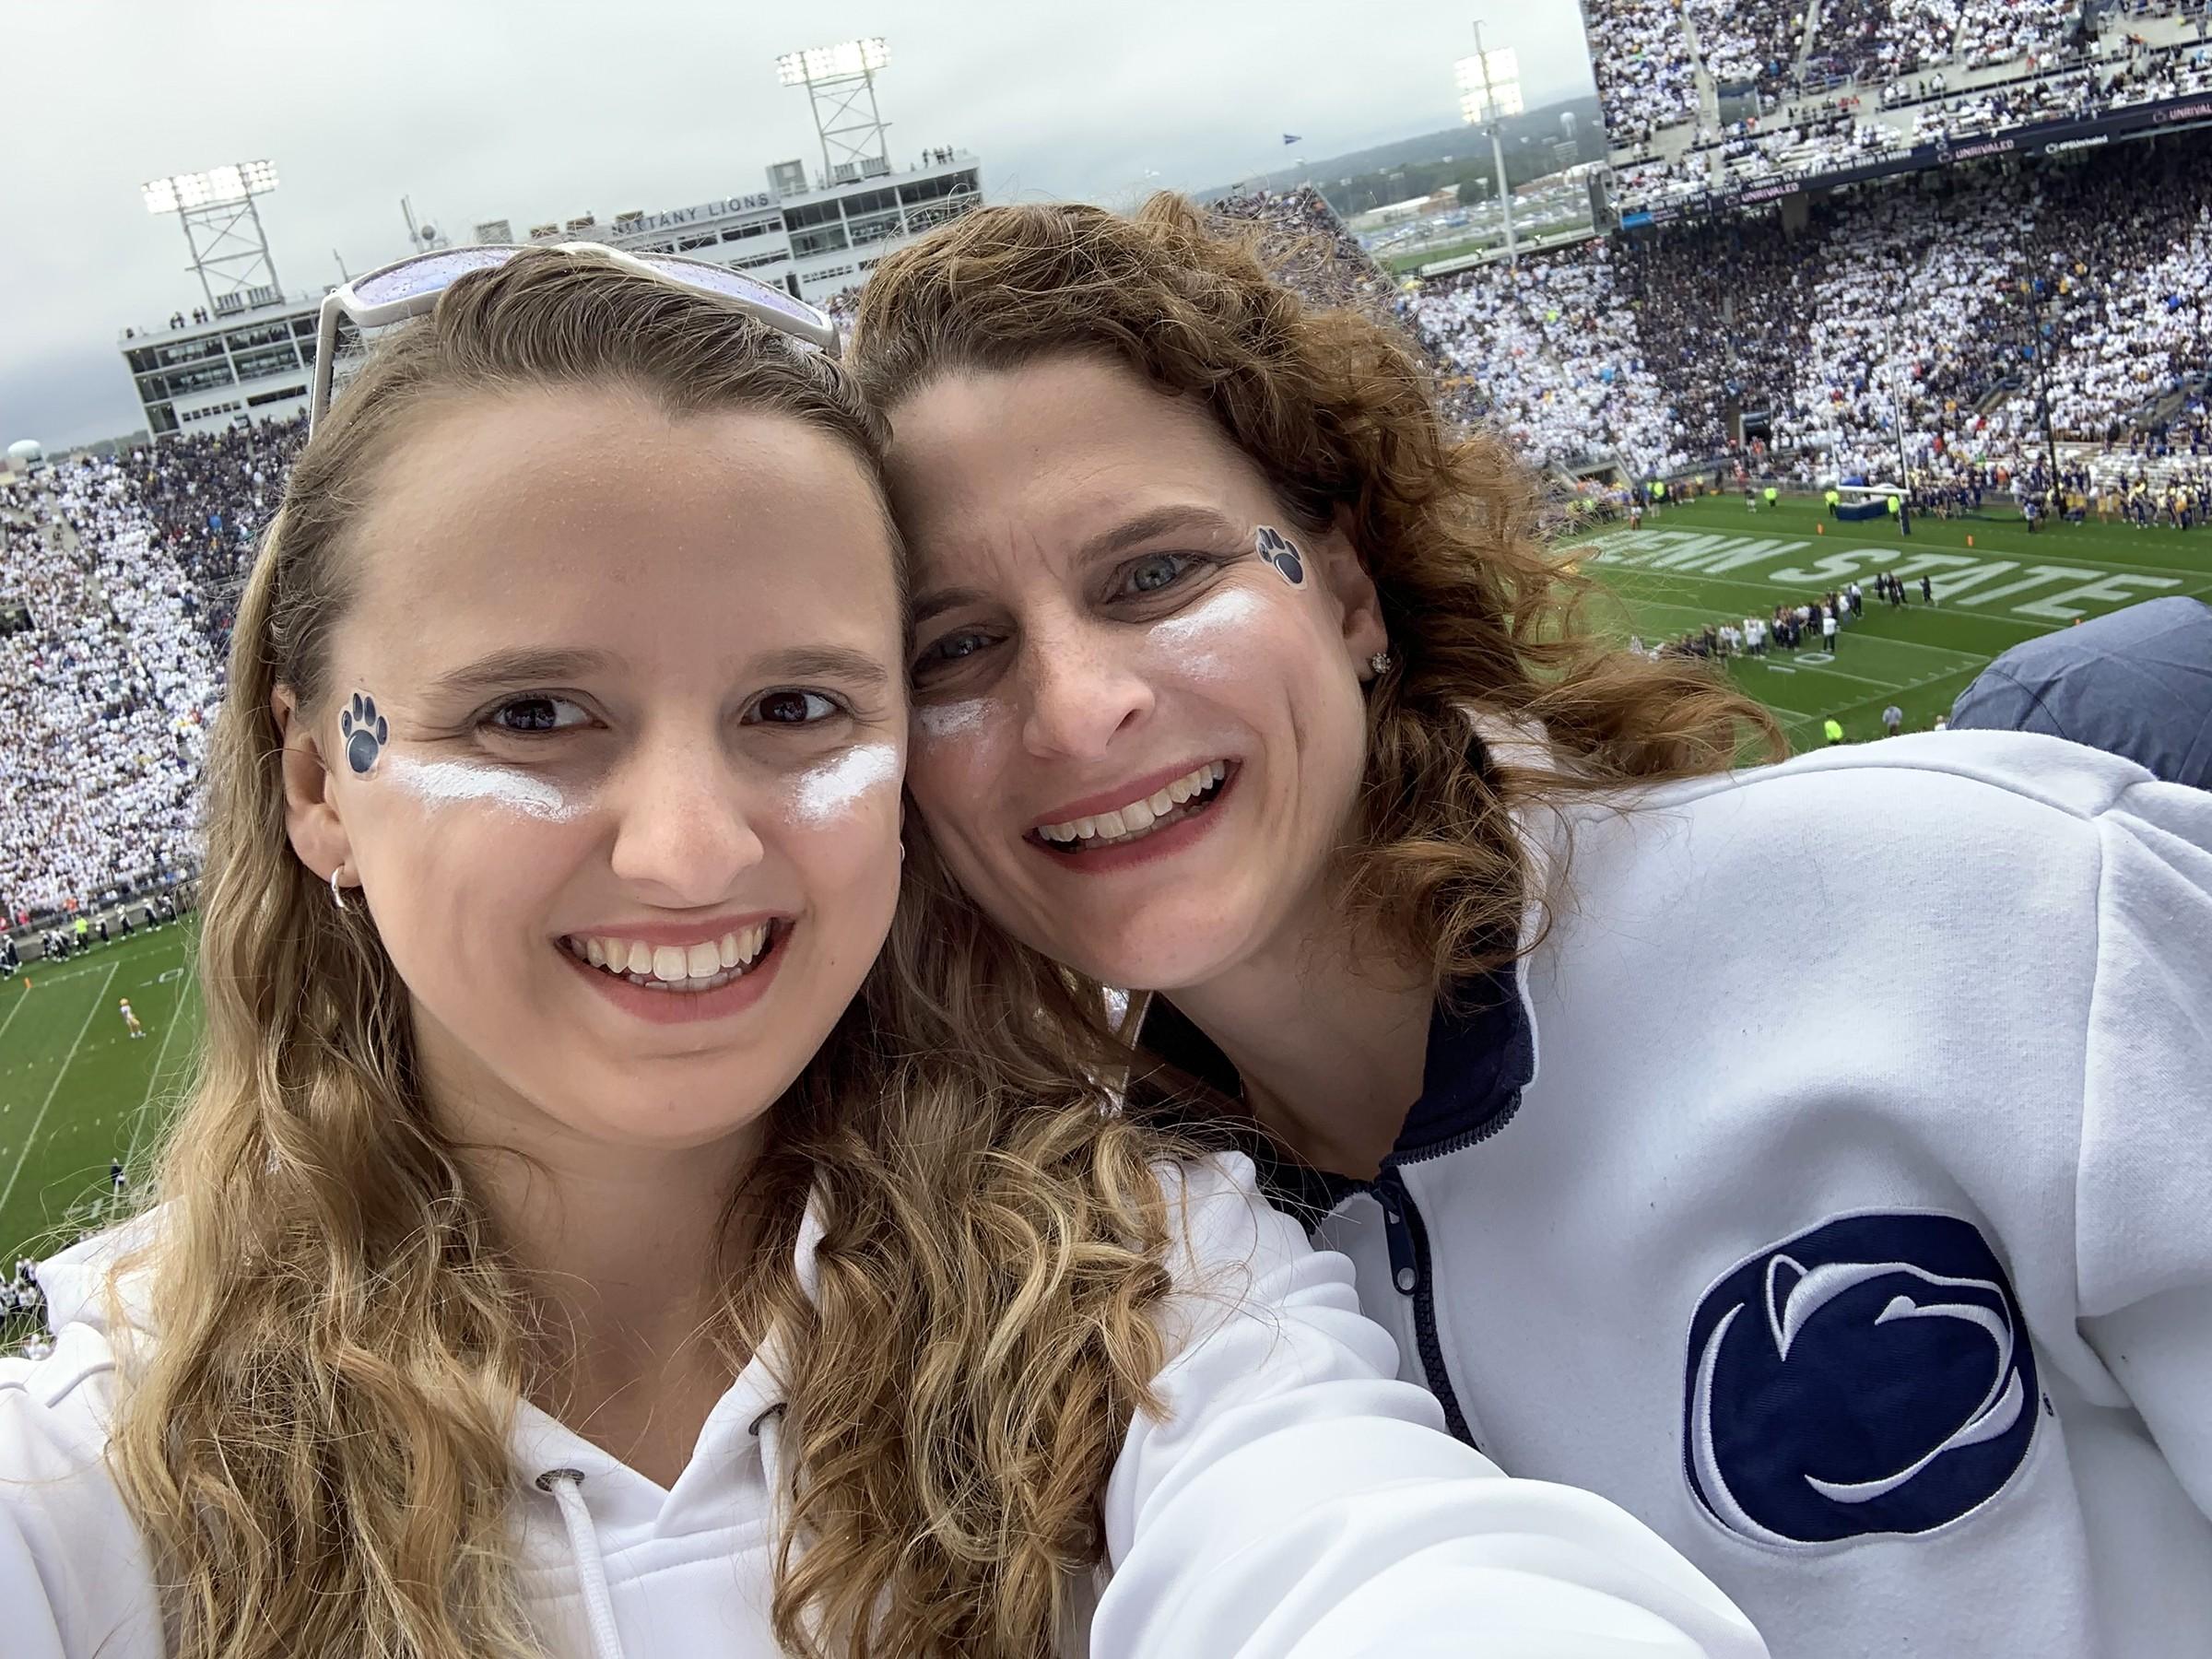 Katie and Jennifer Ellis at Penn State football game.